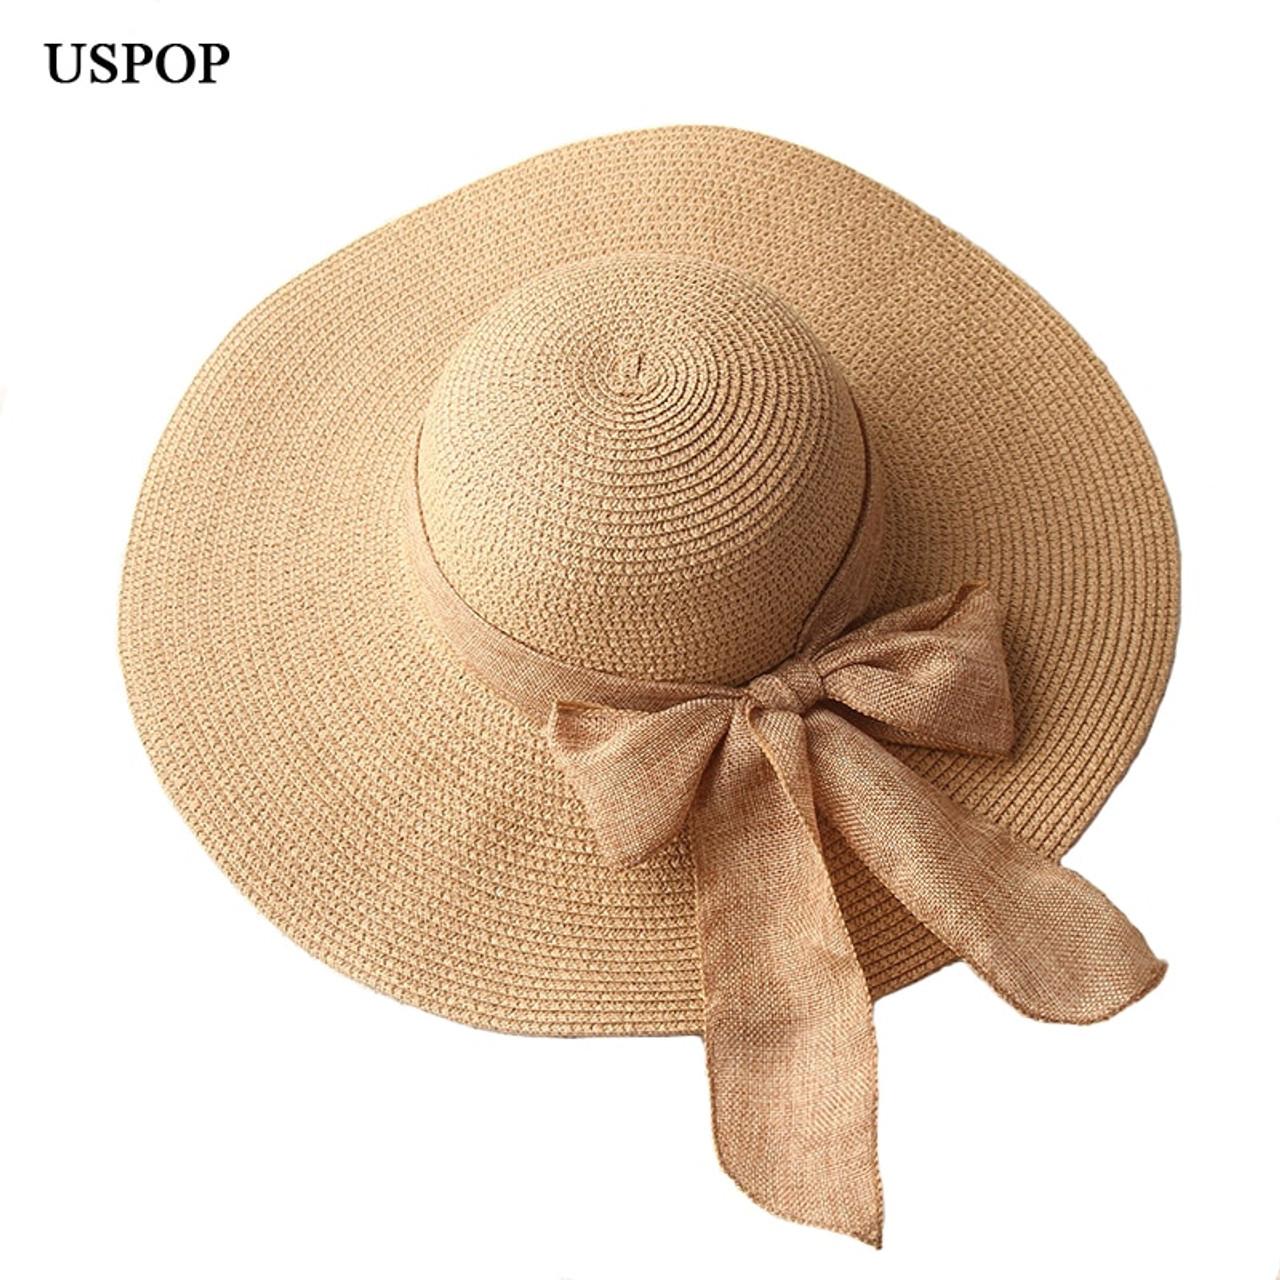 5151410b46965 ... USPOP 2019 fashion women sun hats hand made straw hat female ribbon  bow-knot wide ...